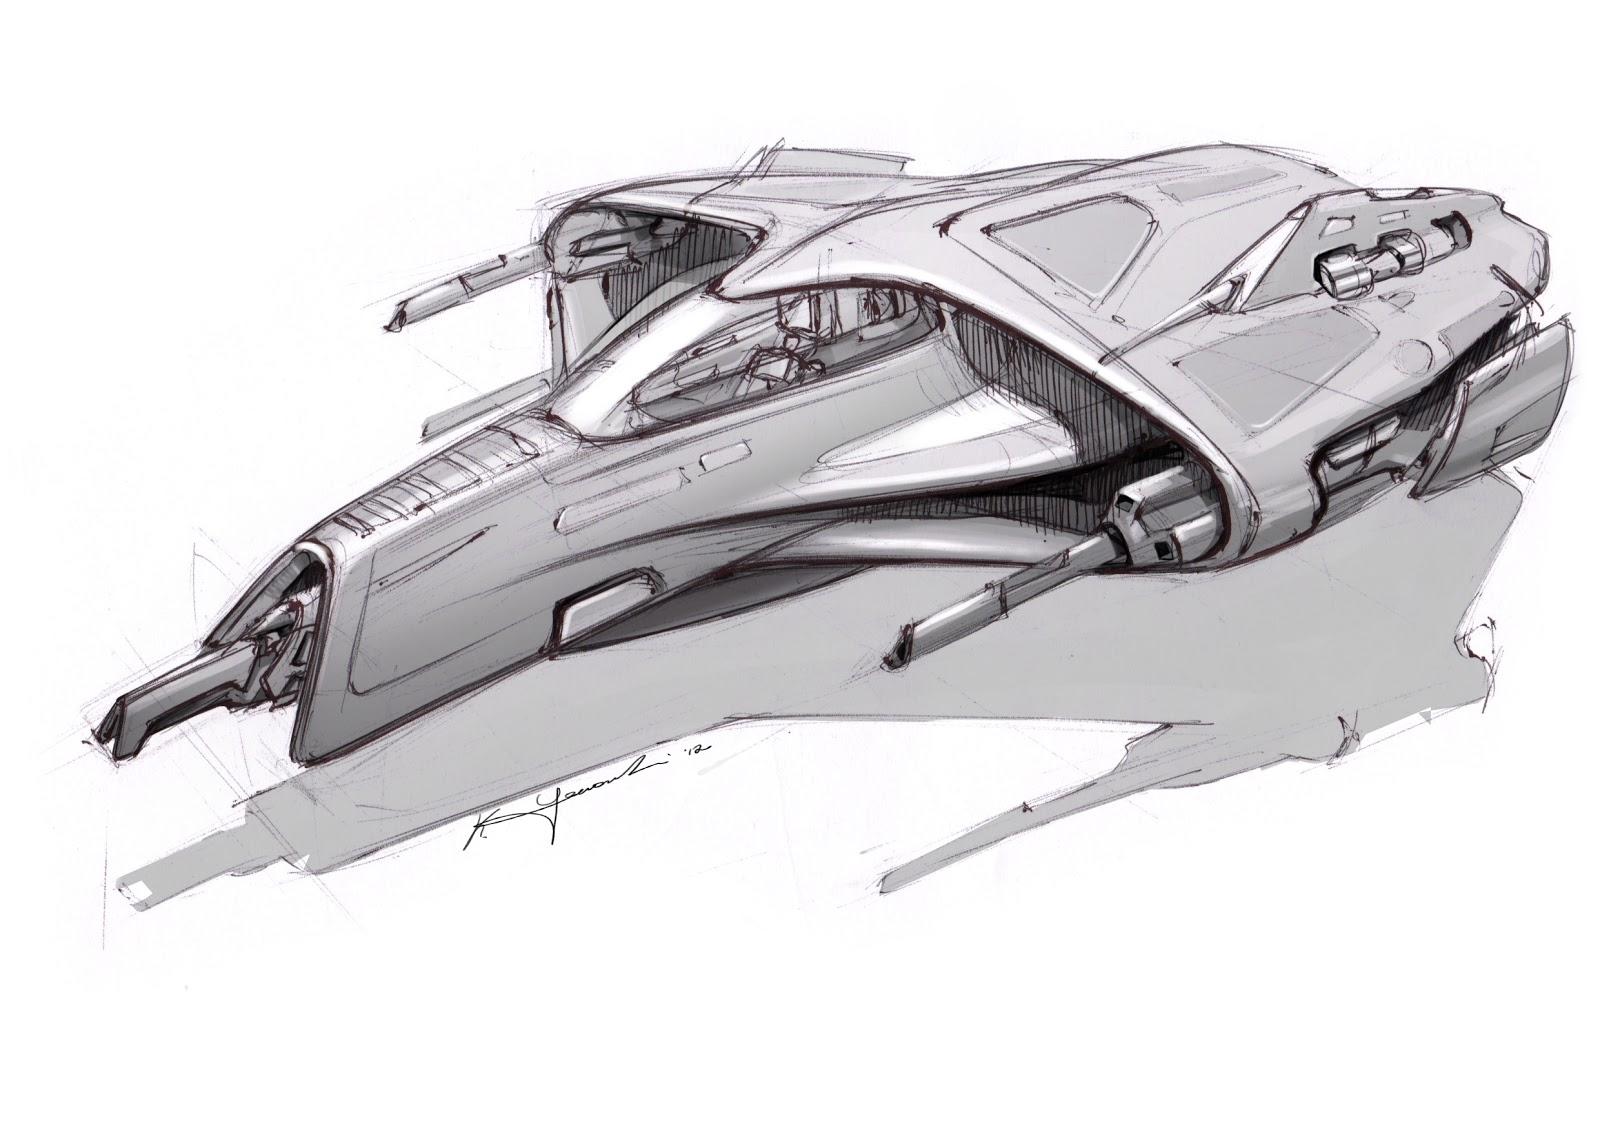 amazoncom blast spaceship sketches and renderings - HD1600×1132